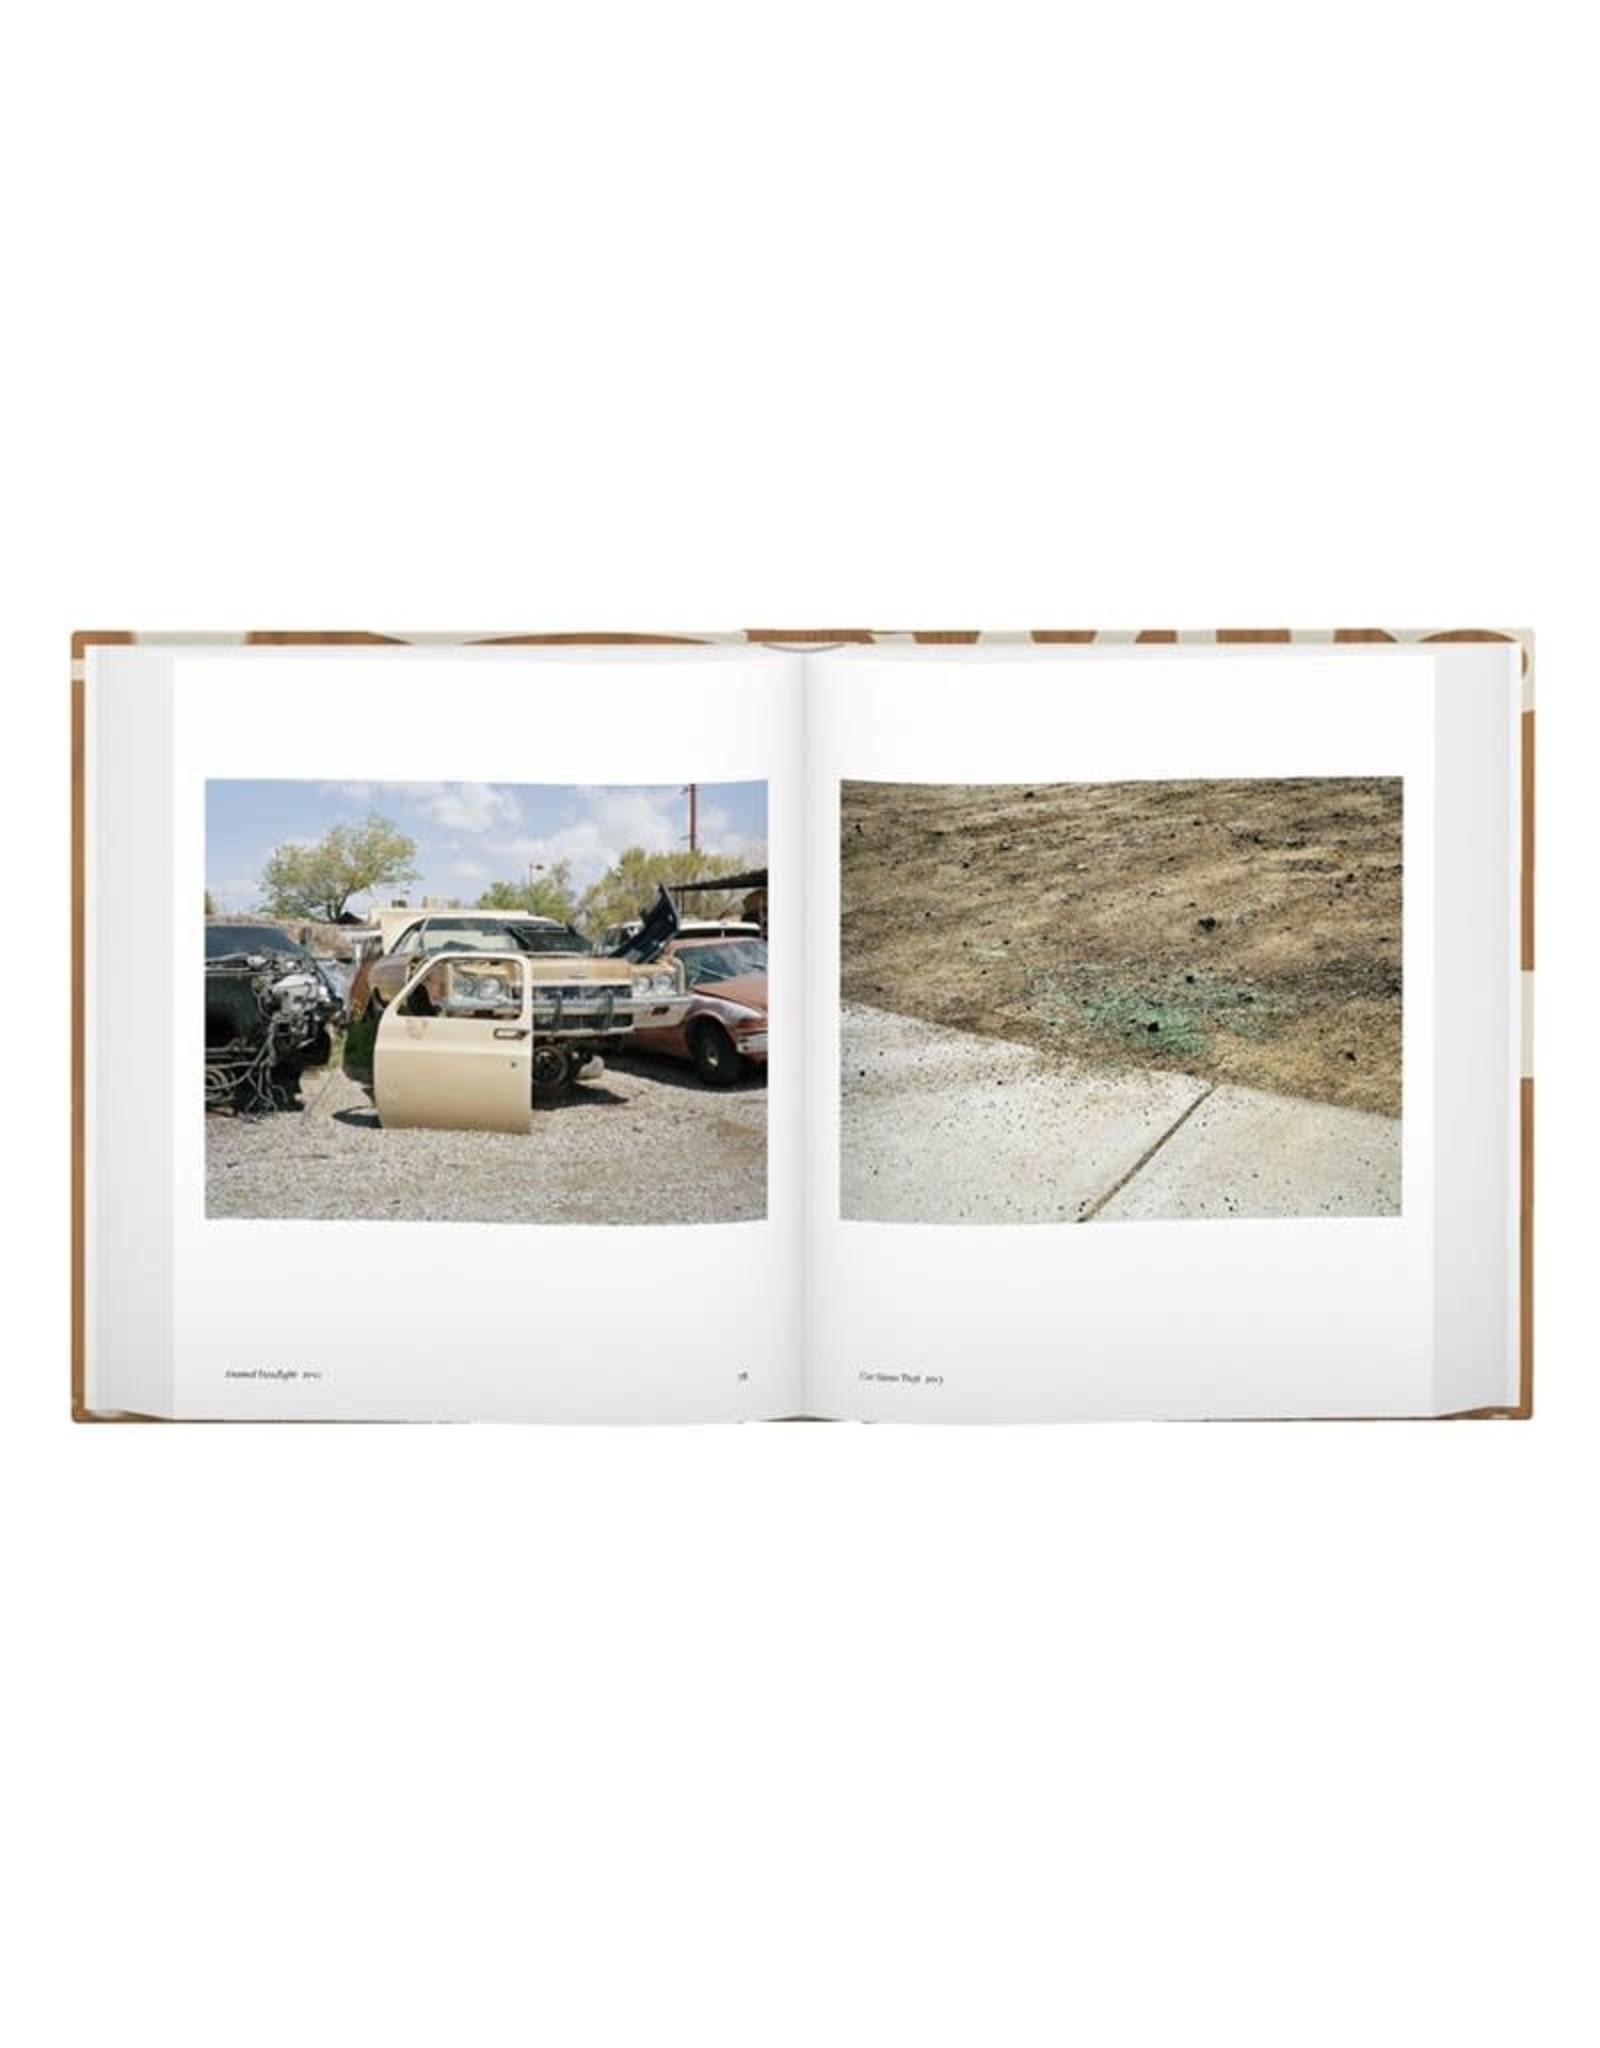 Justine Kurland: Highway Kind